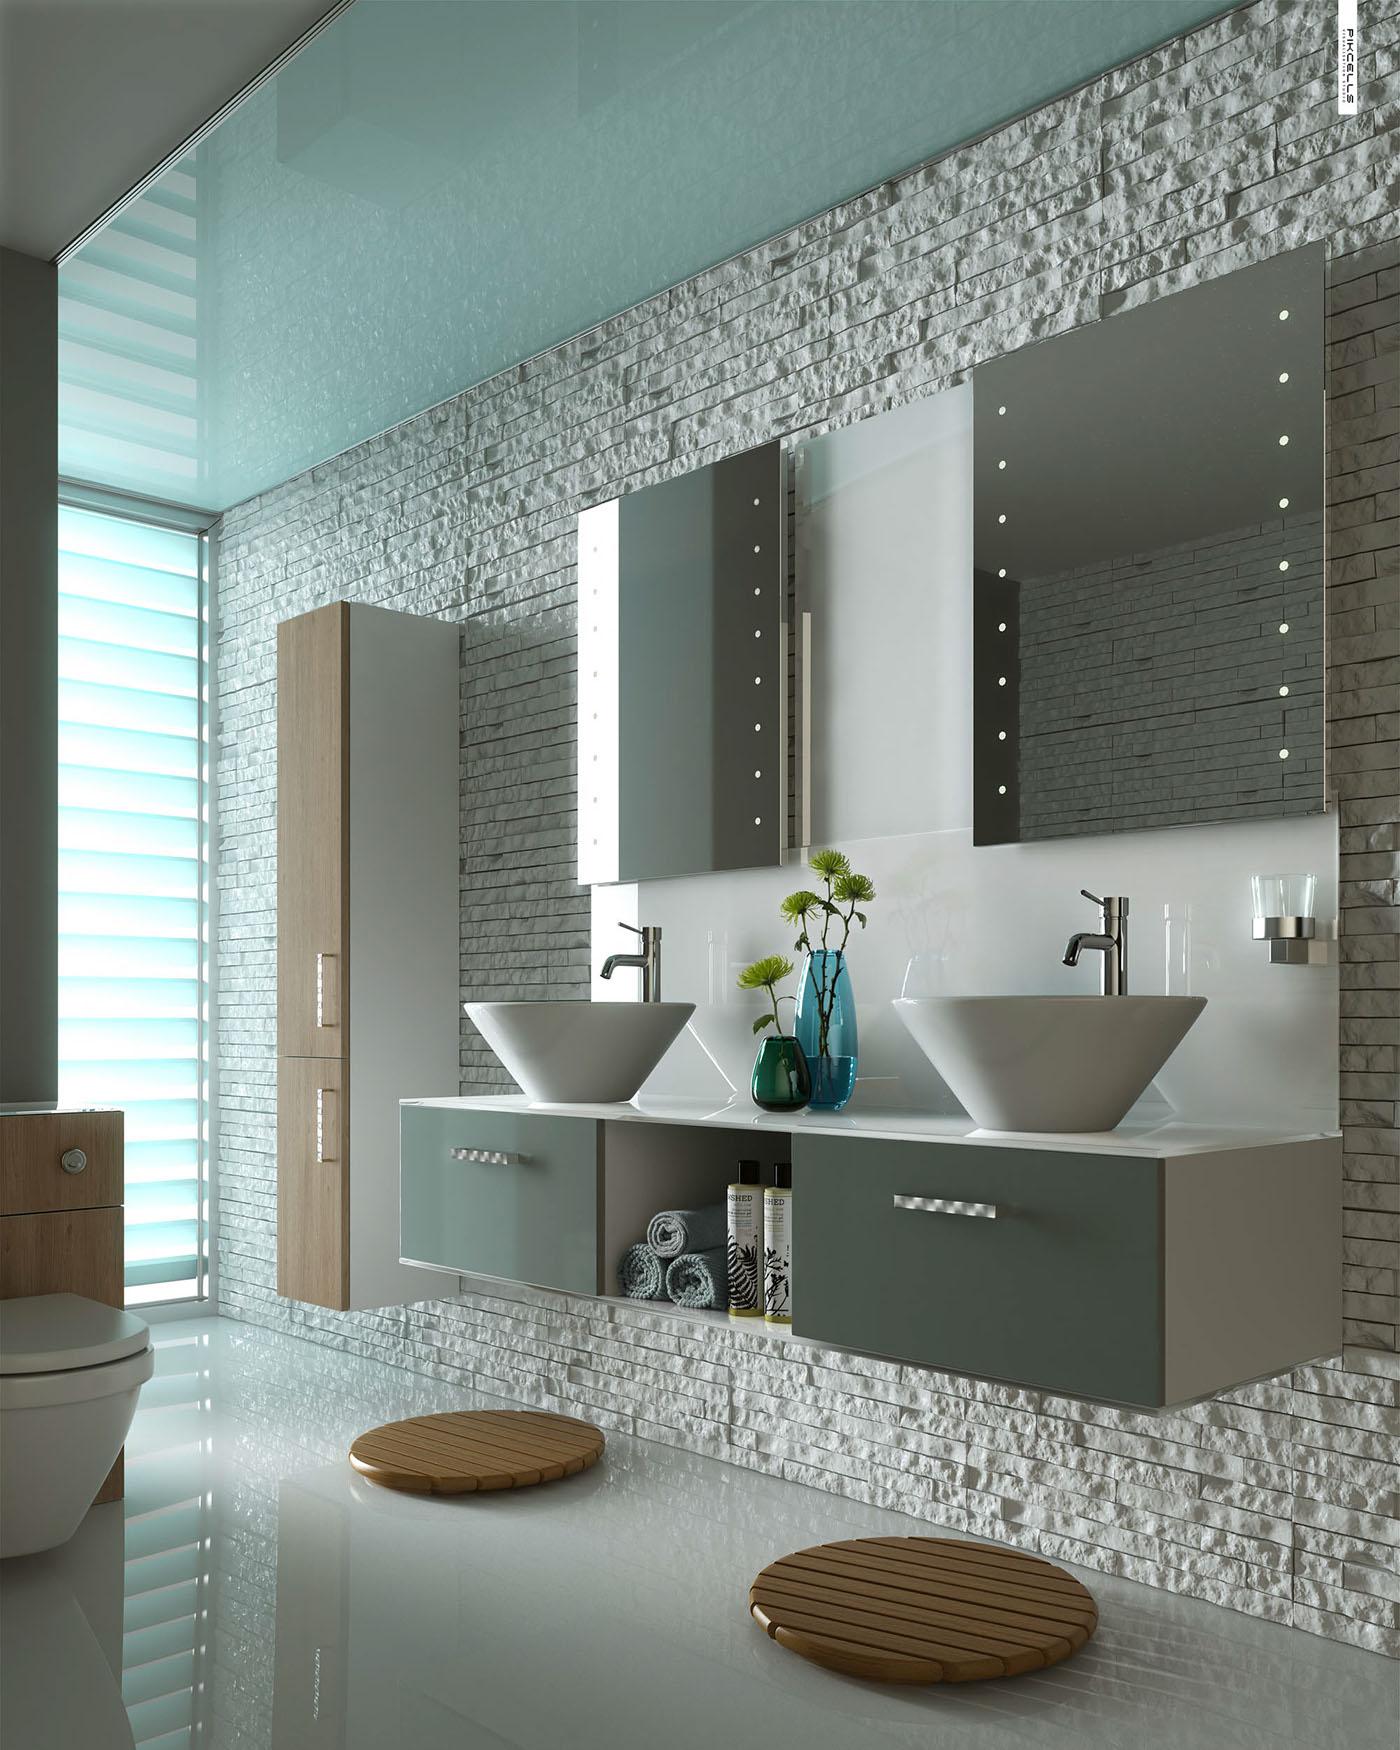 Bathroom Cgi Project On Behance